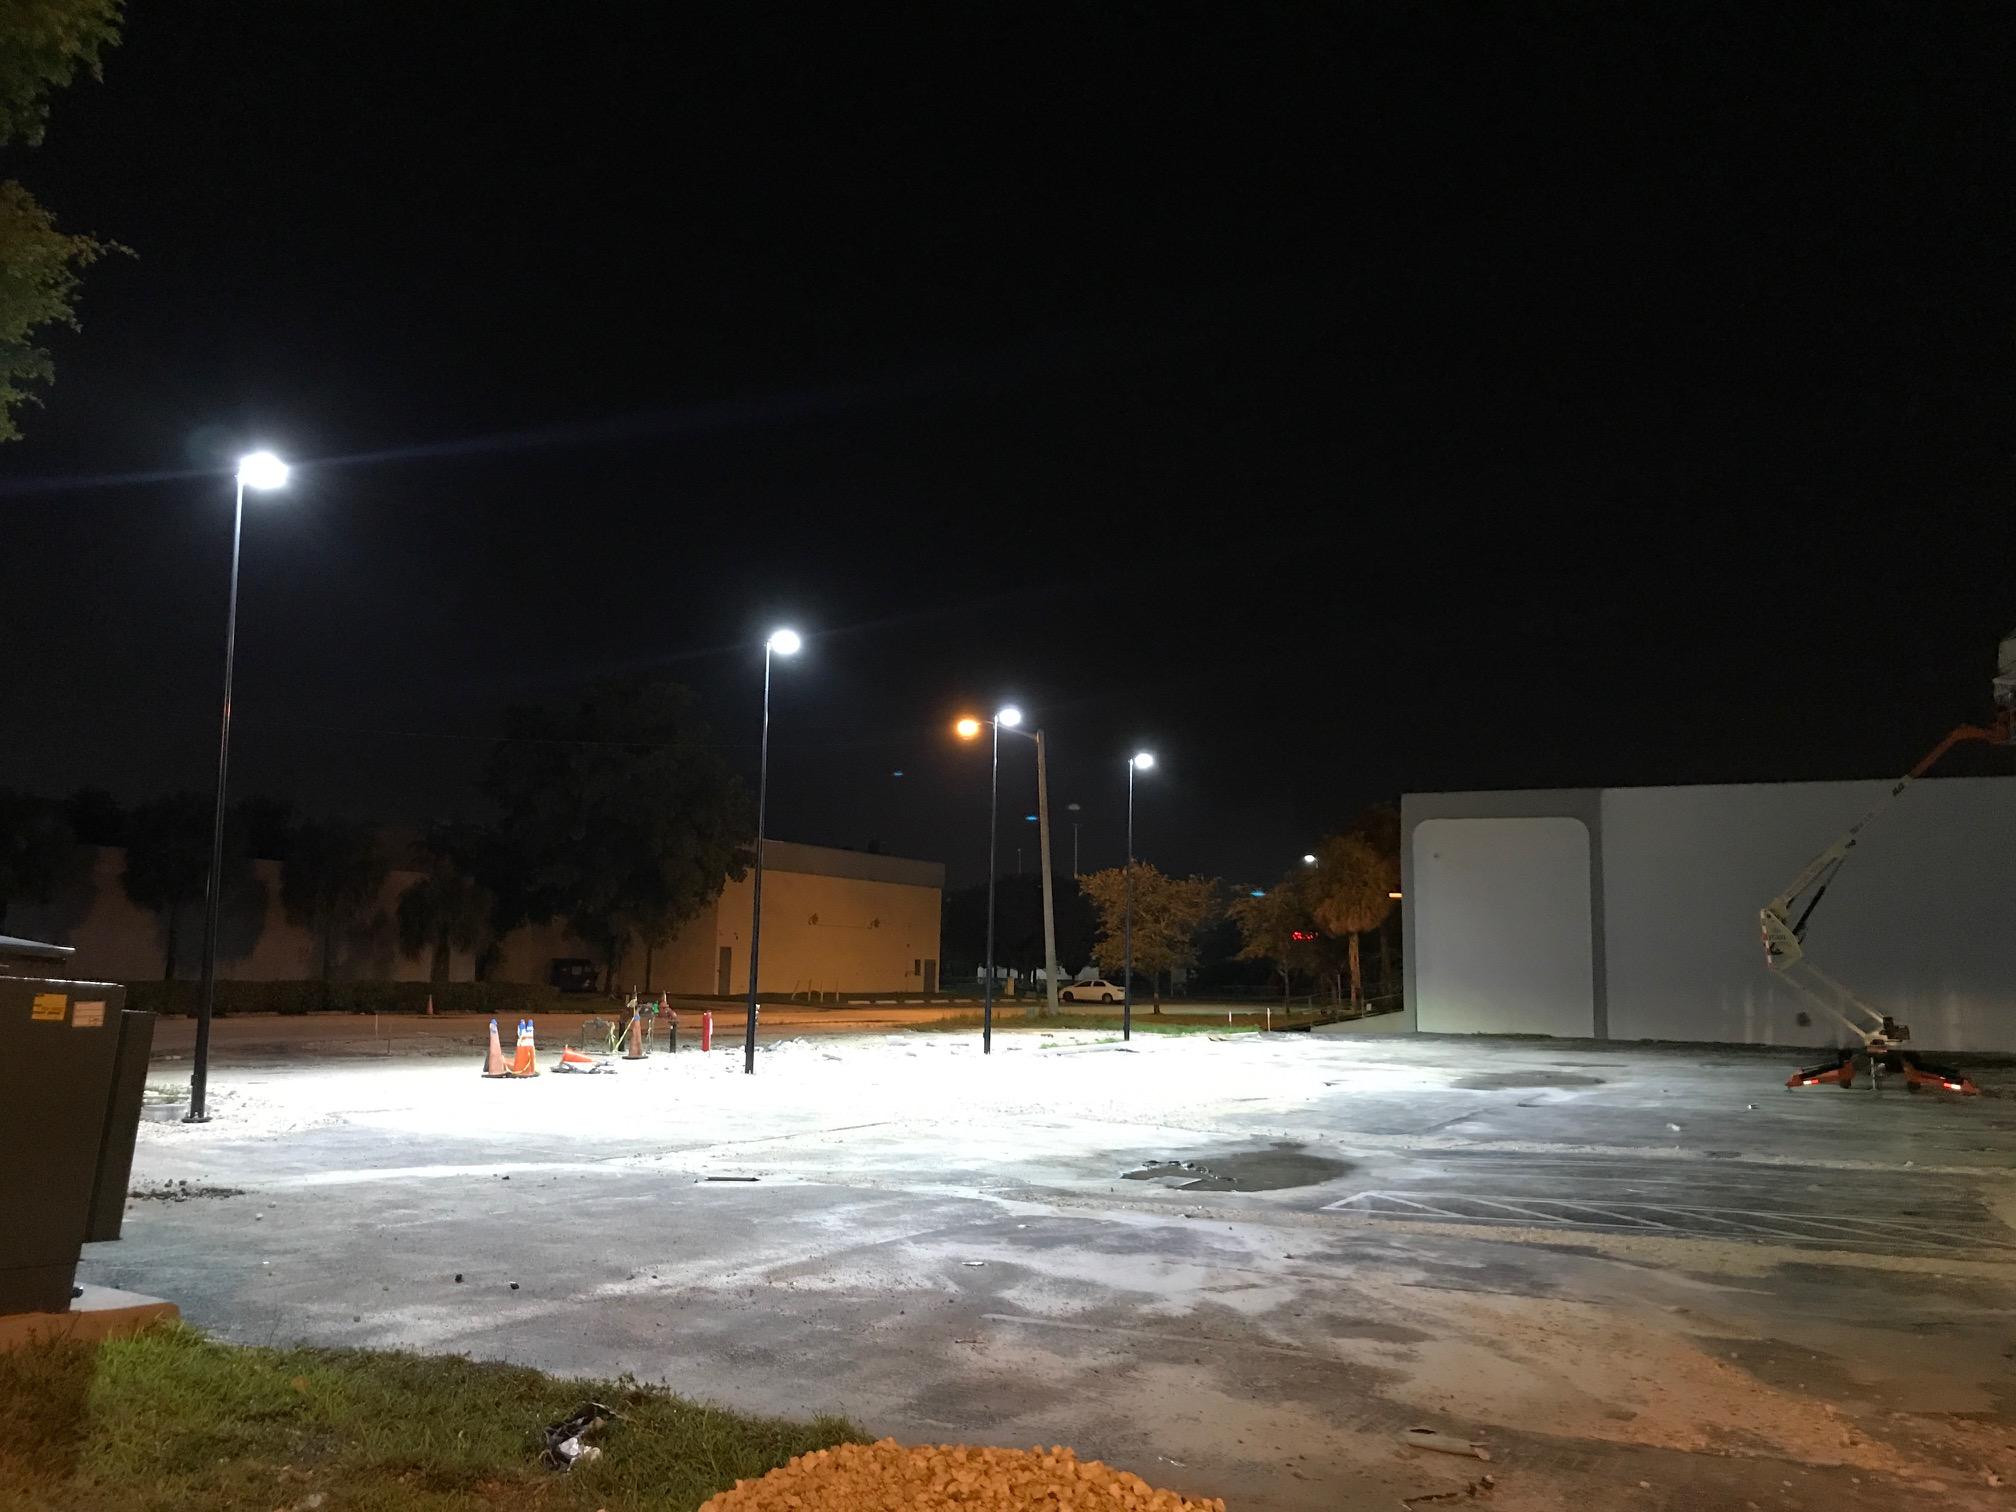 light-pole-parking-lot-1.jpg